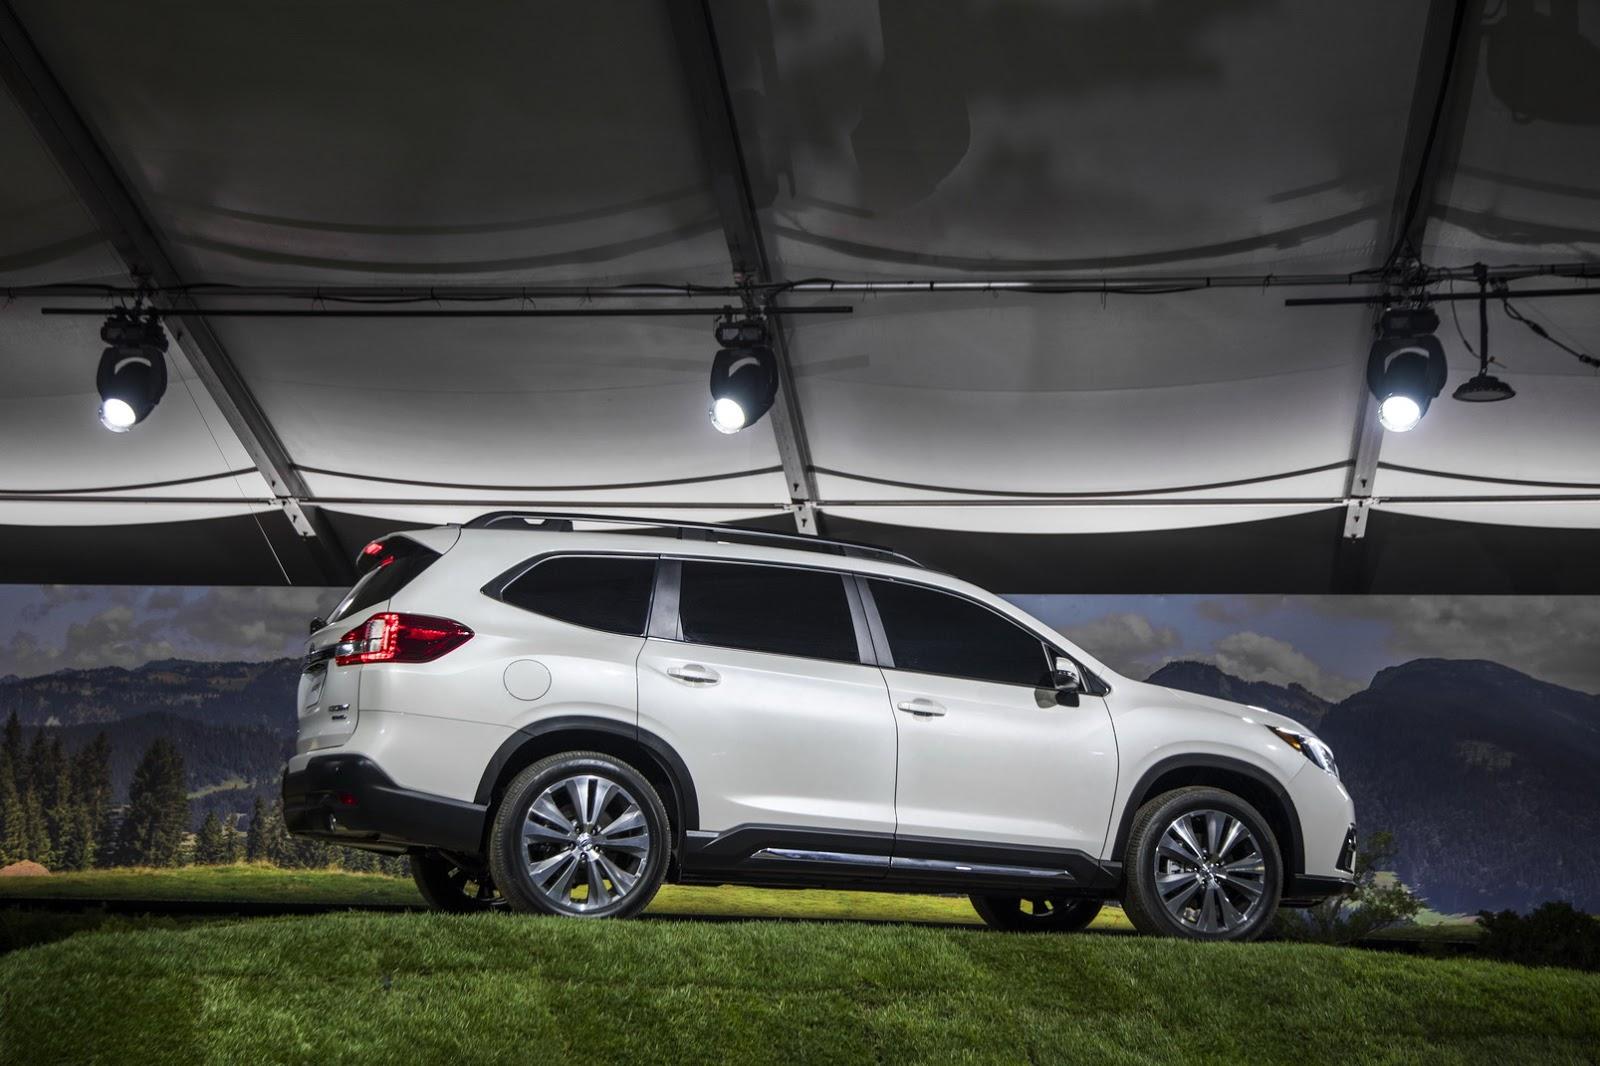 Subaru Xv 2019 >> 2019 Subaru Ascent Production Will Create New Jobs At Indiana Plant - autoevolution